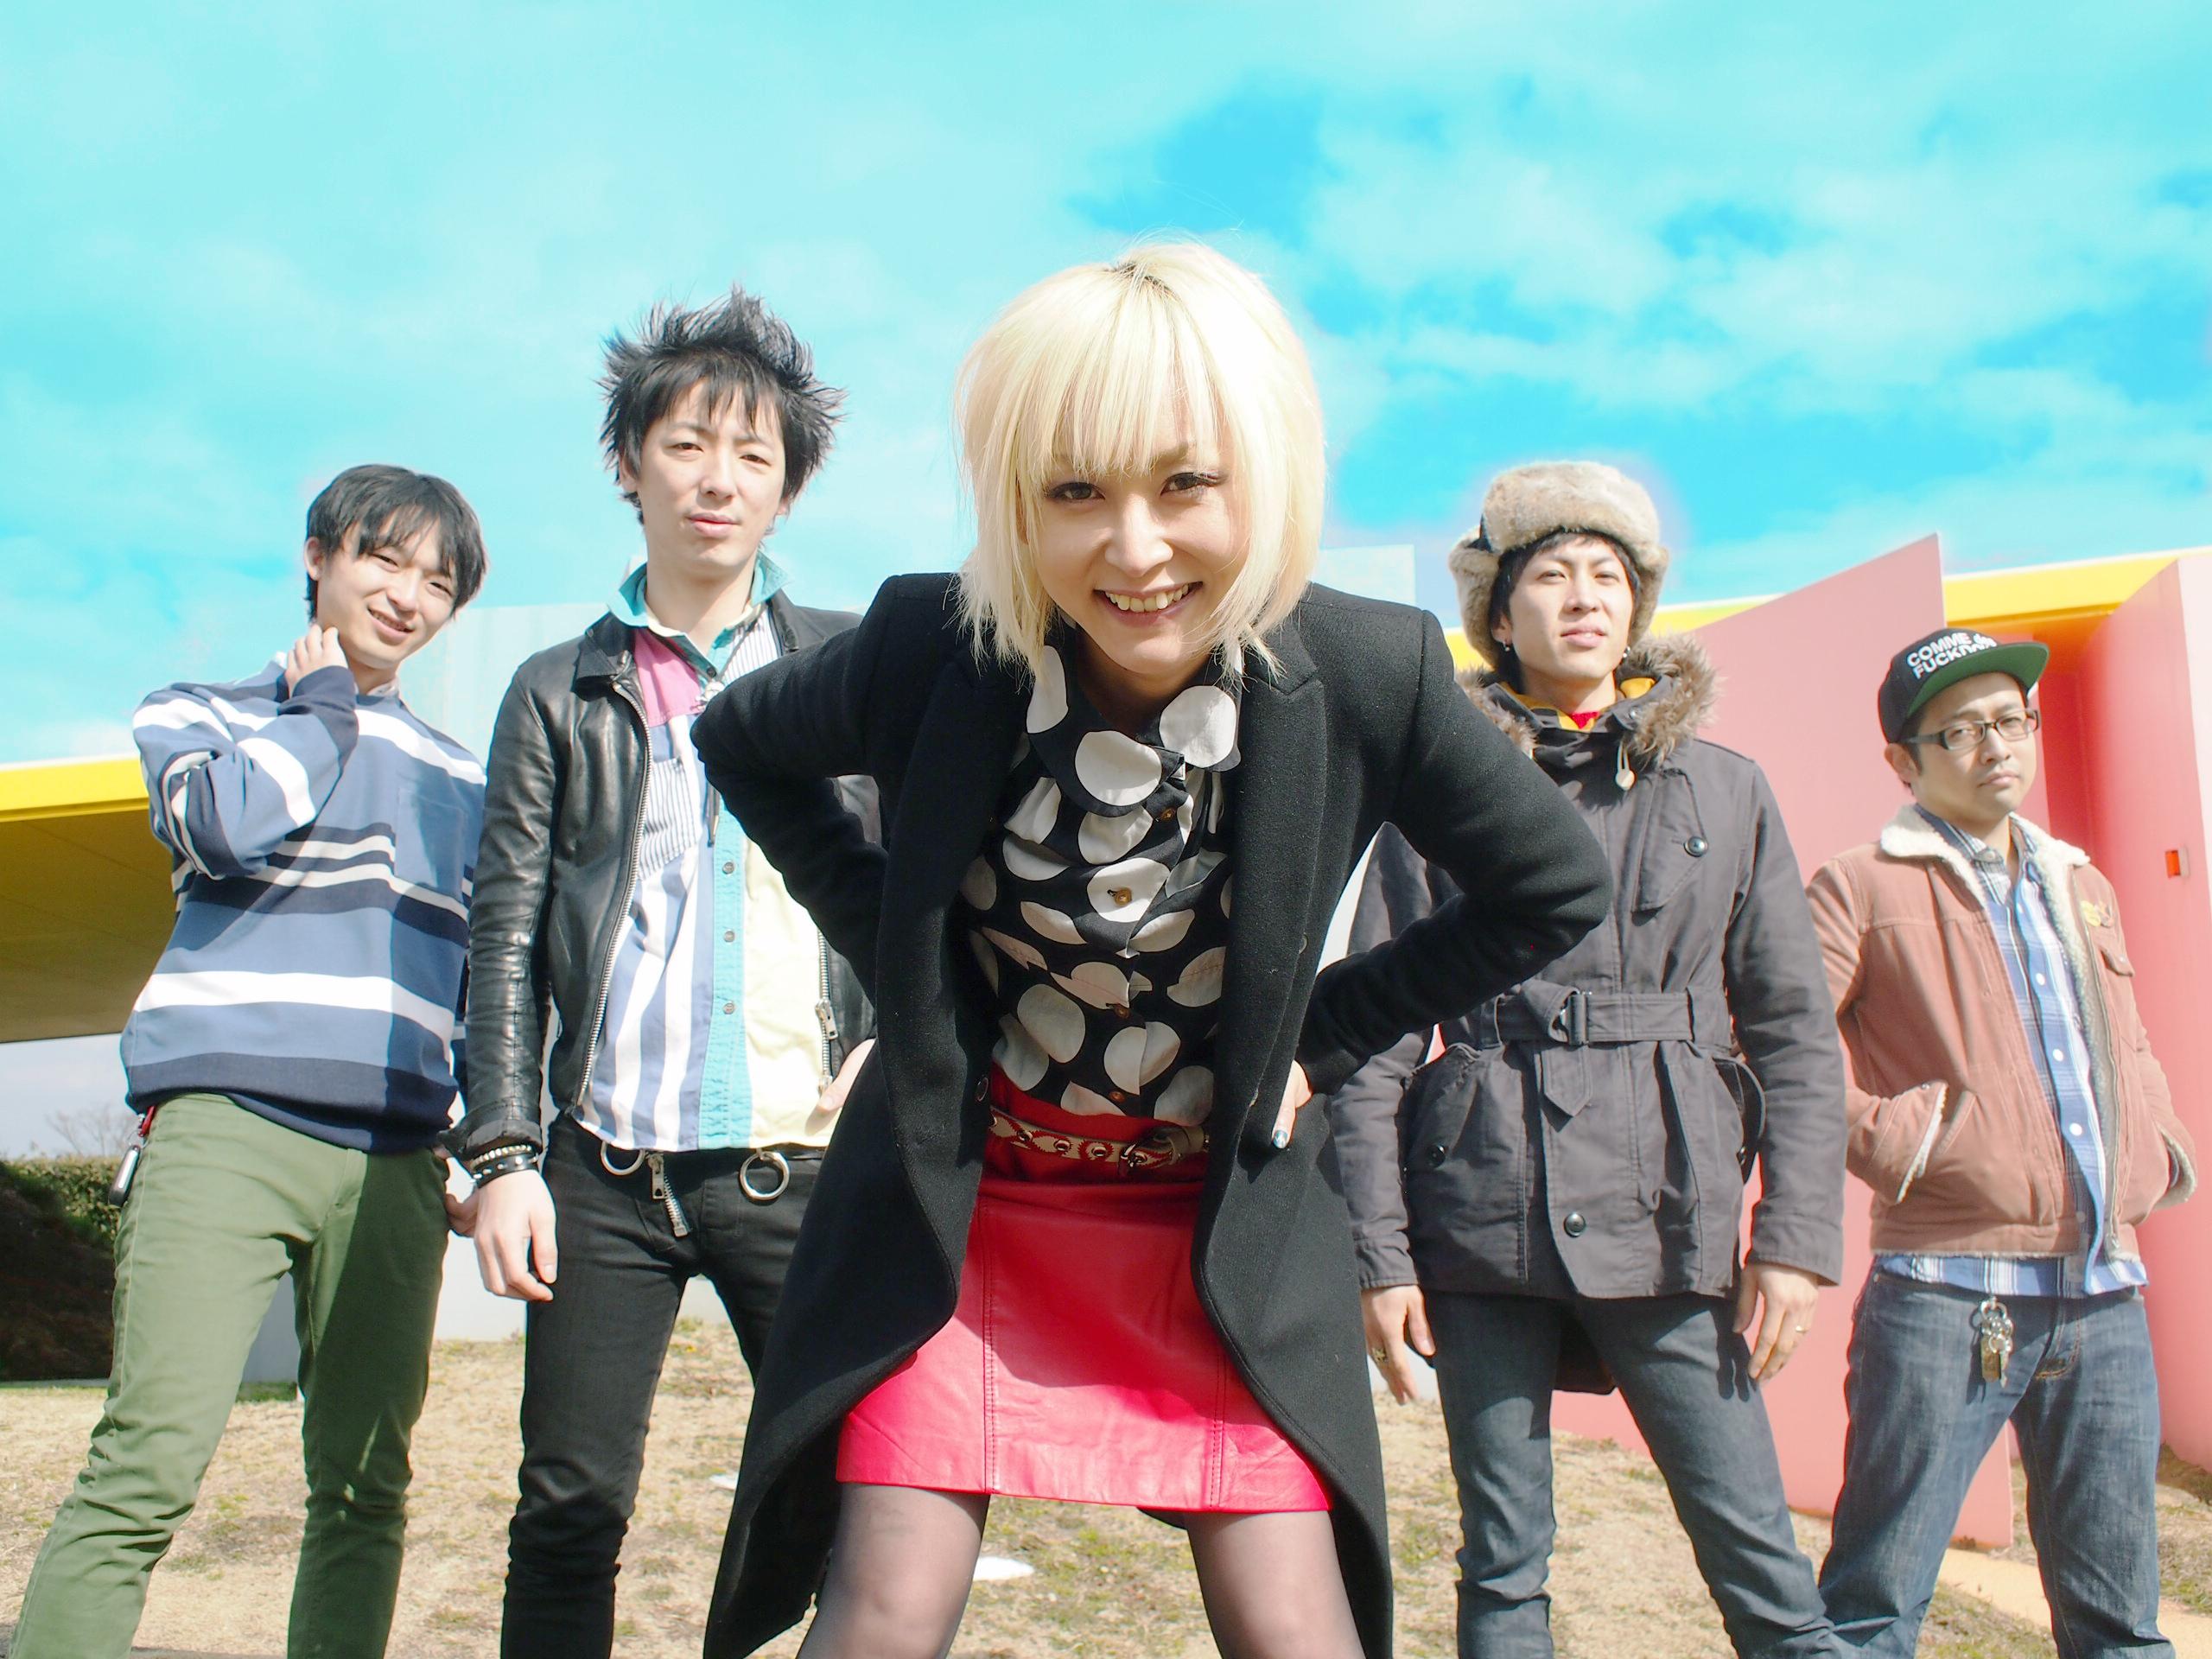 XERO FICTION 3rdフルアルバム『POP OVERDOSE!』インタビュー掲載!